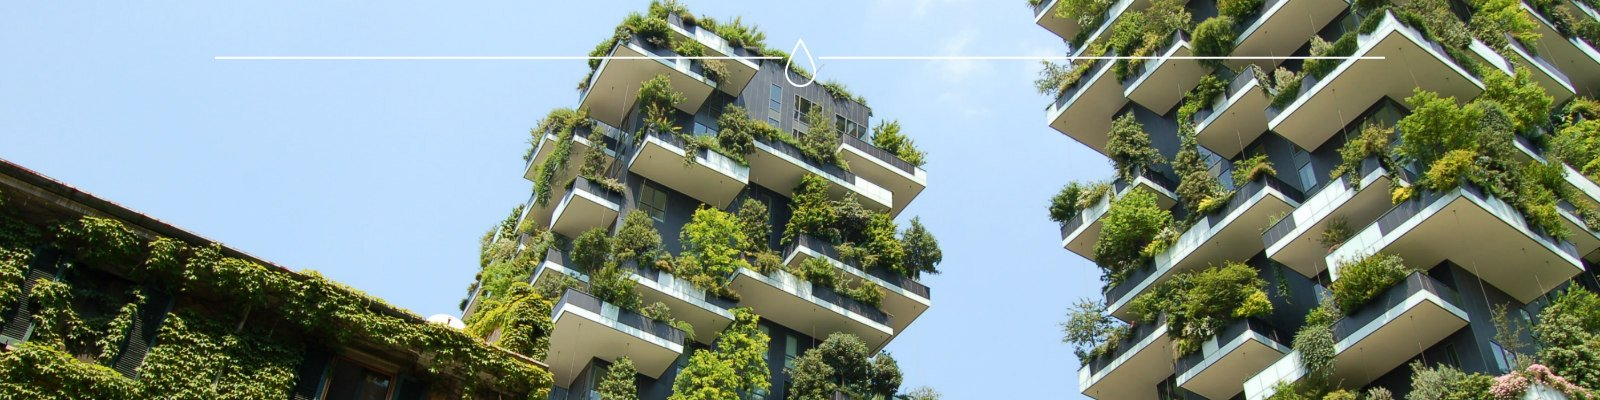 Groen op hoge gebouwen